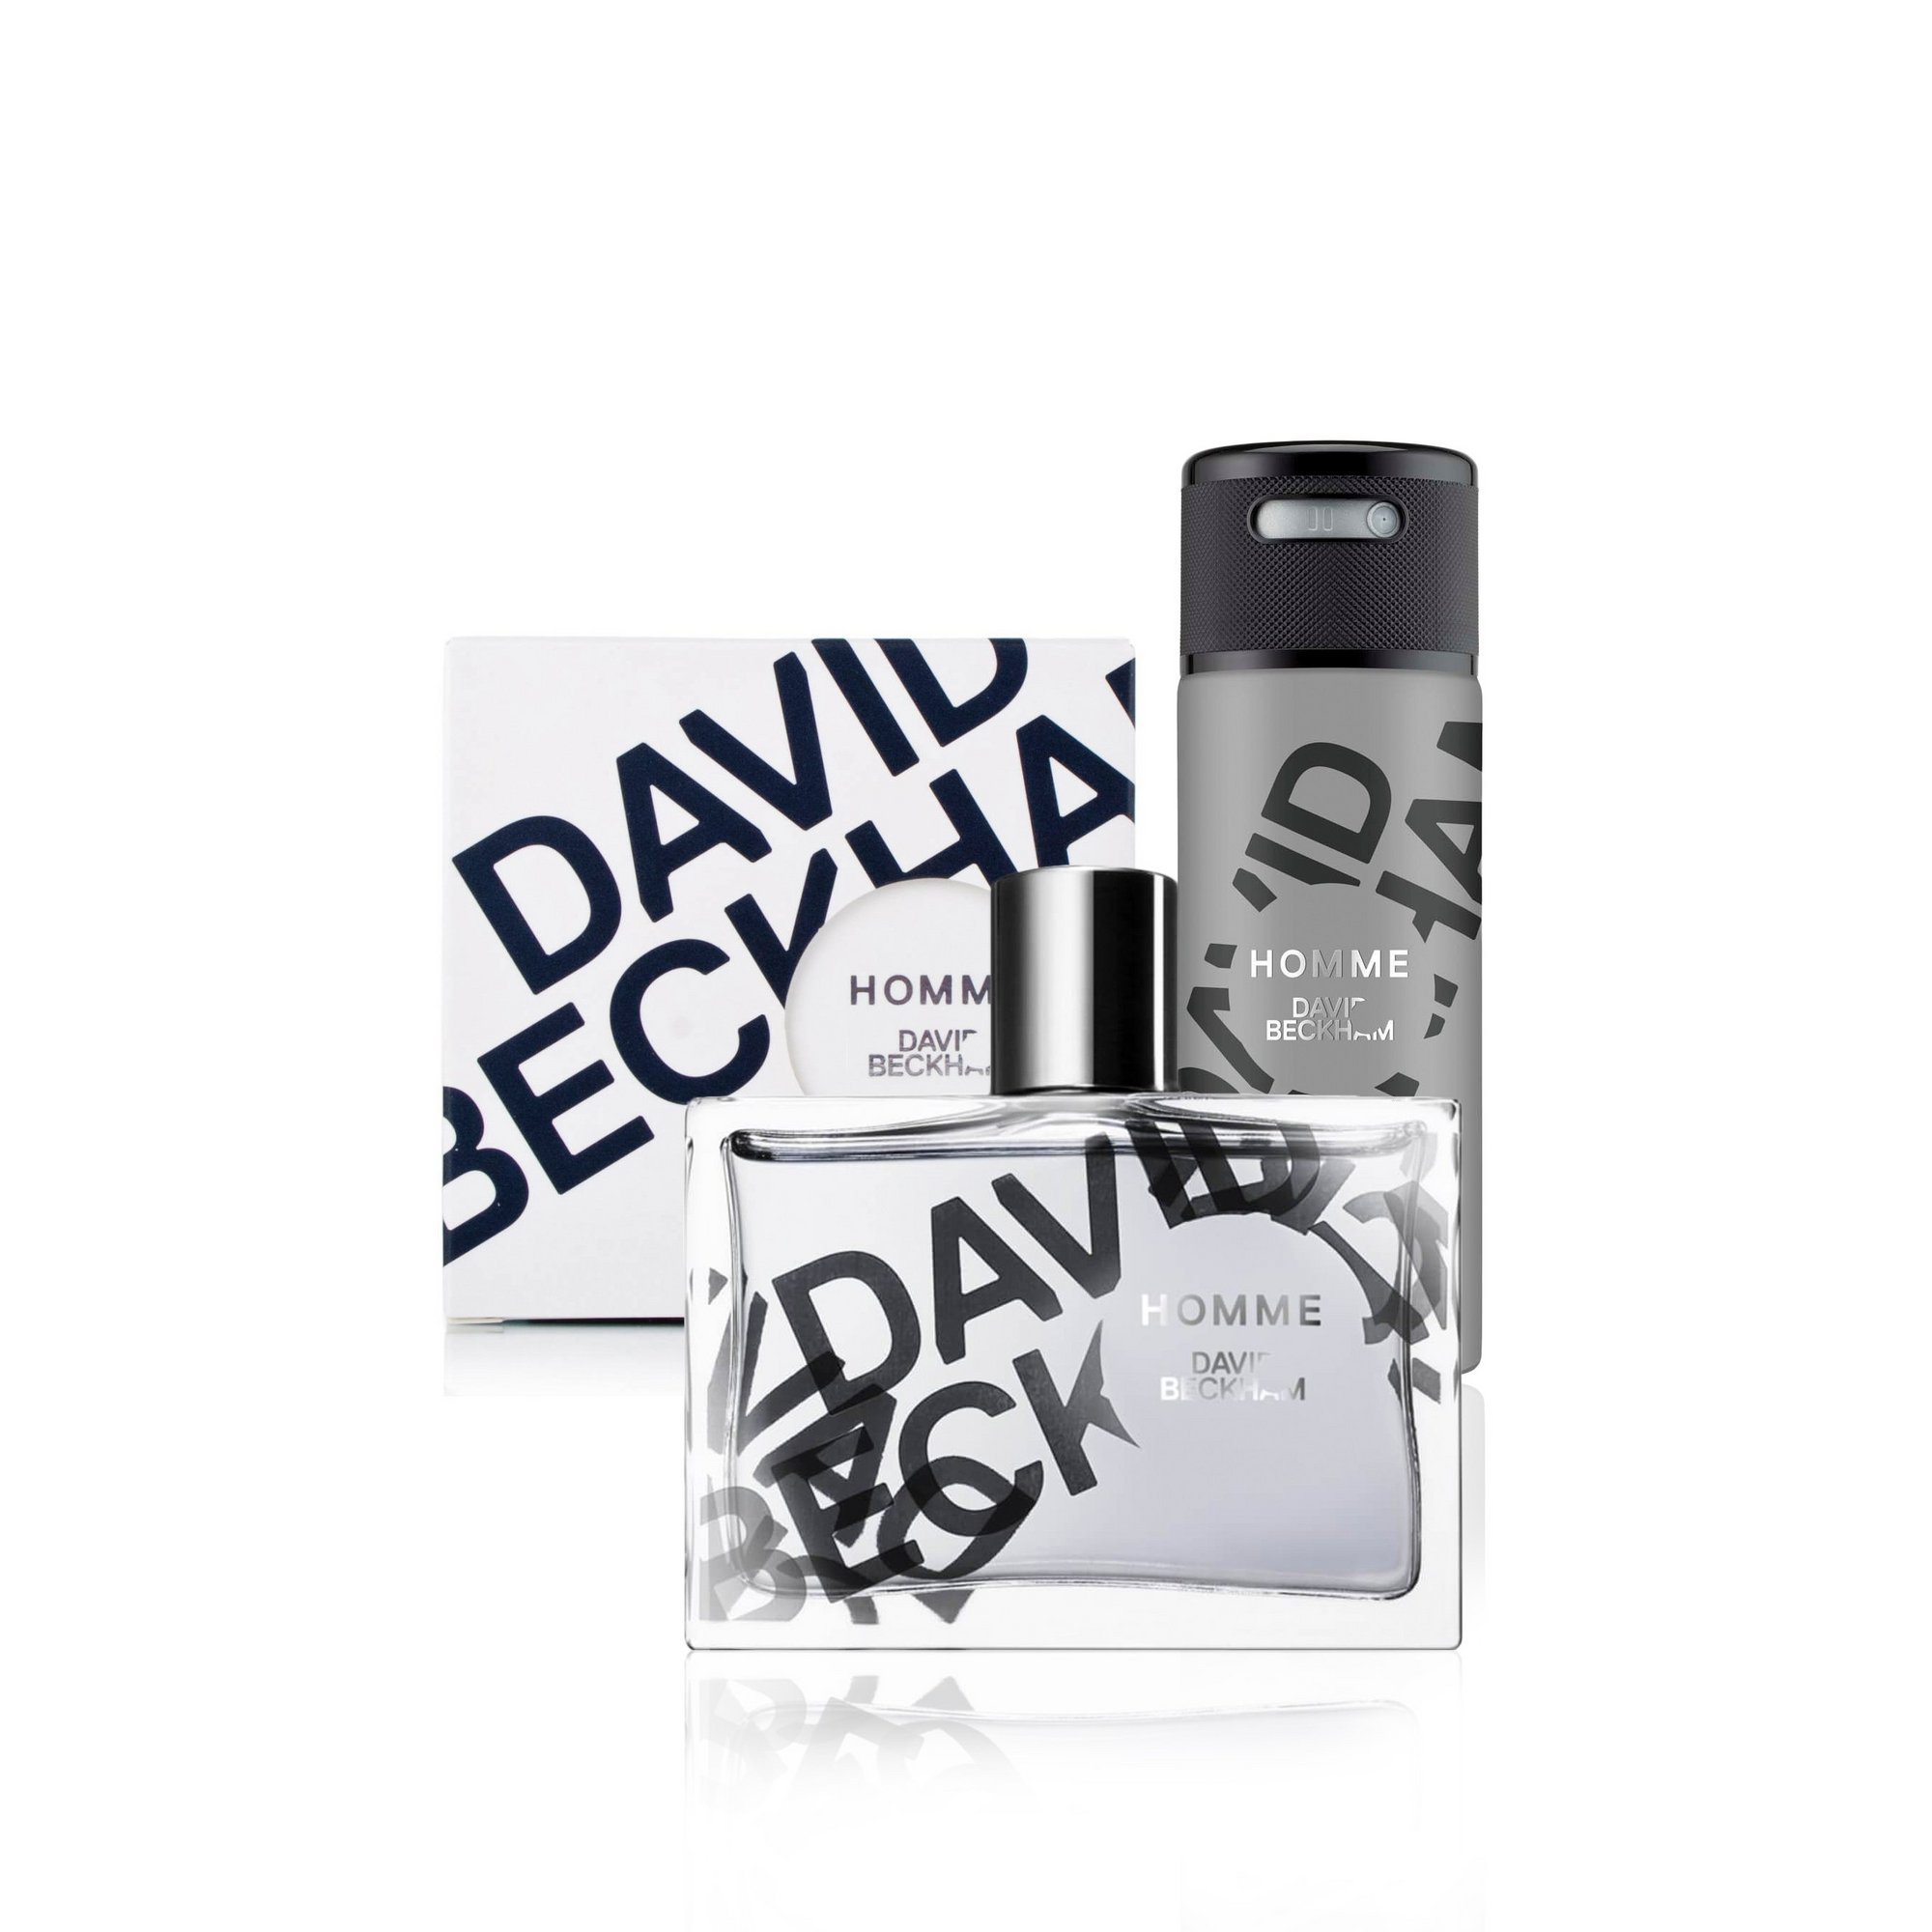 Image of David Beckham Homme 75ml EDT + Deodorant Spray